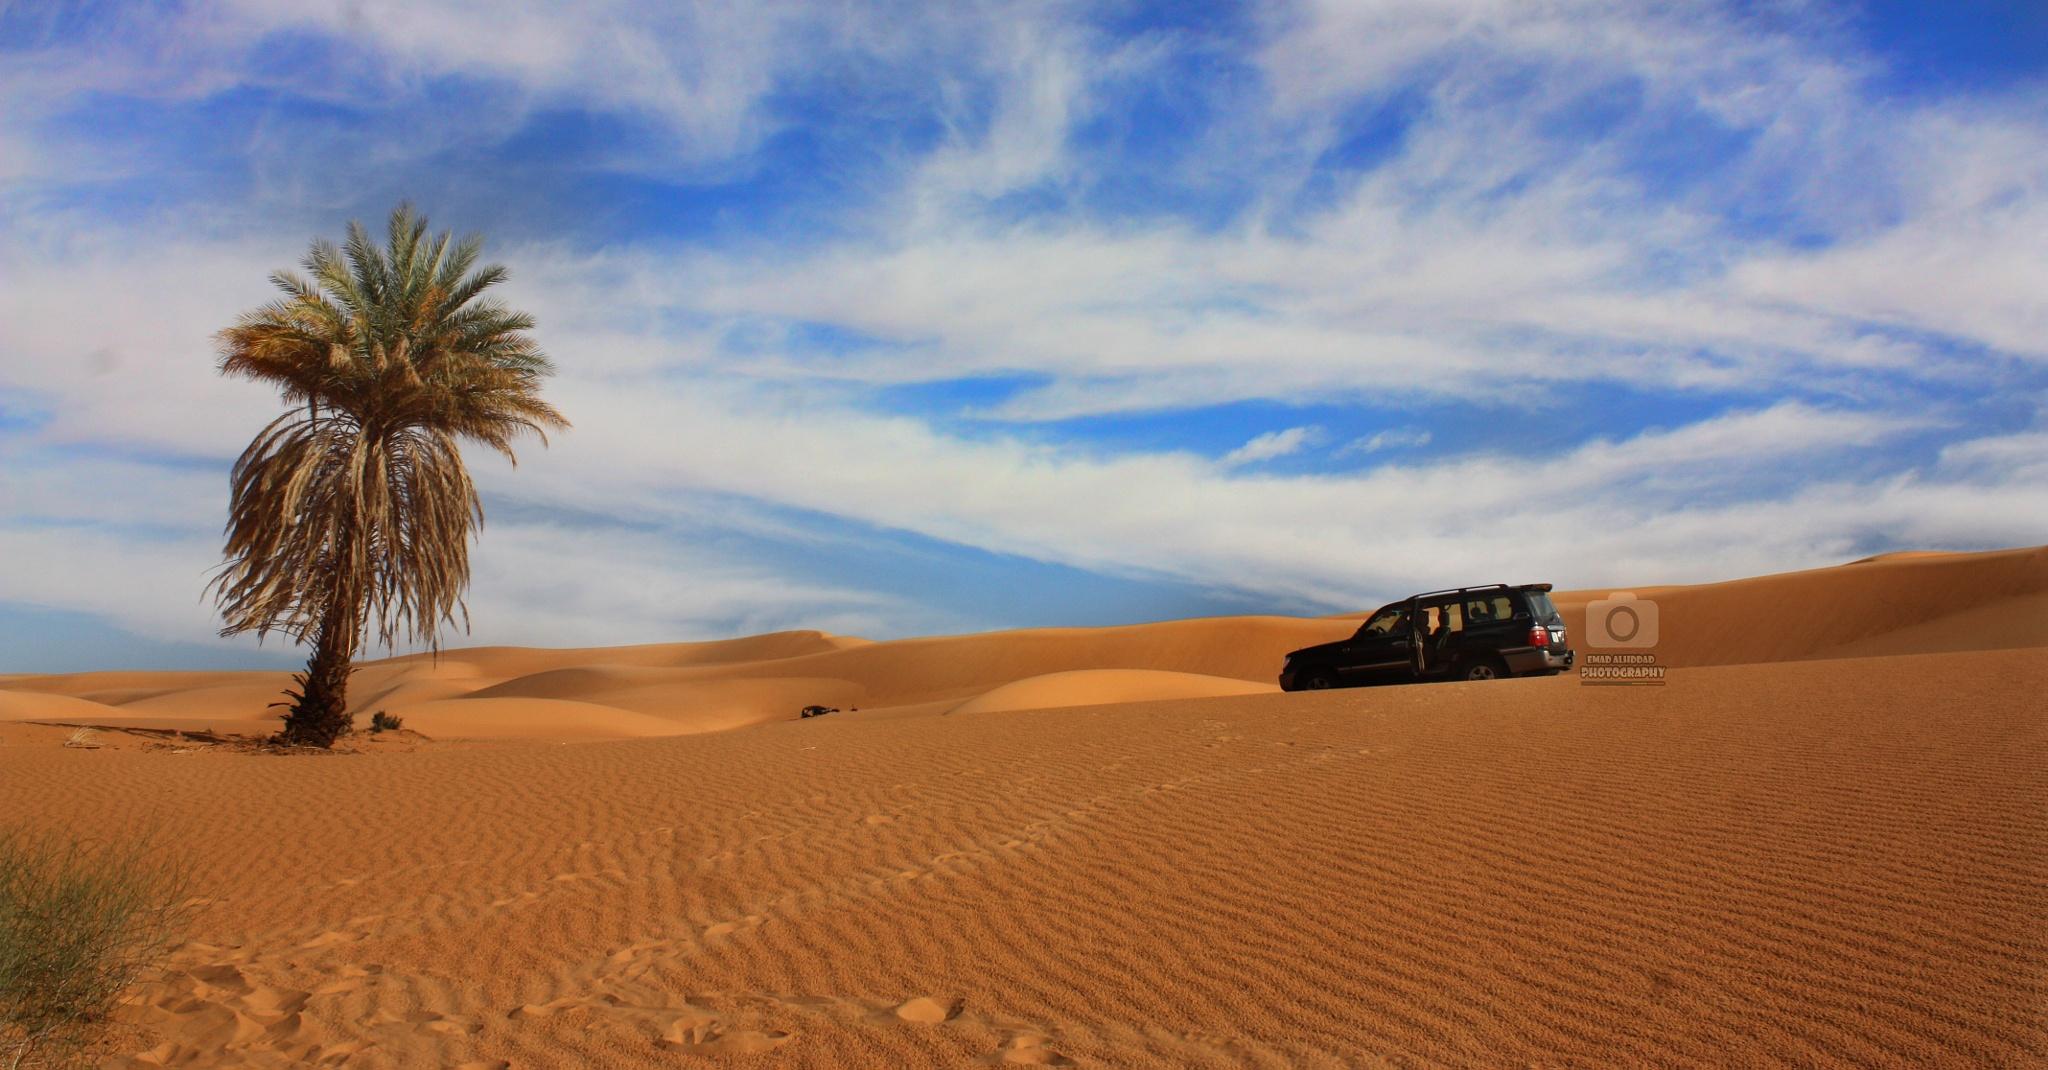 desert libya by emad_alhdad